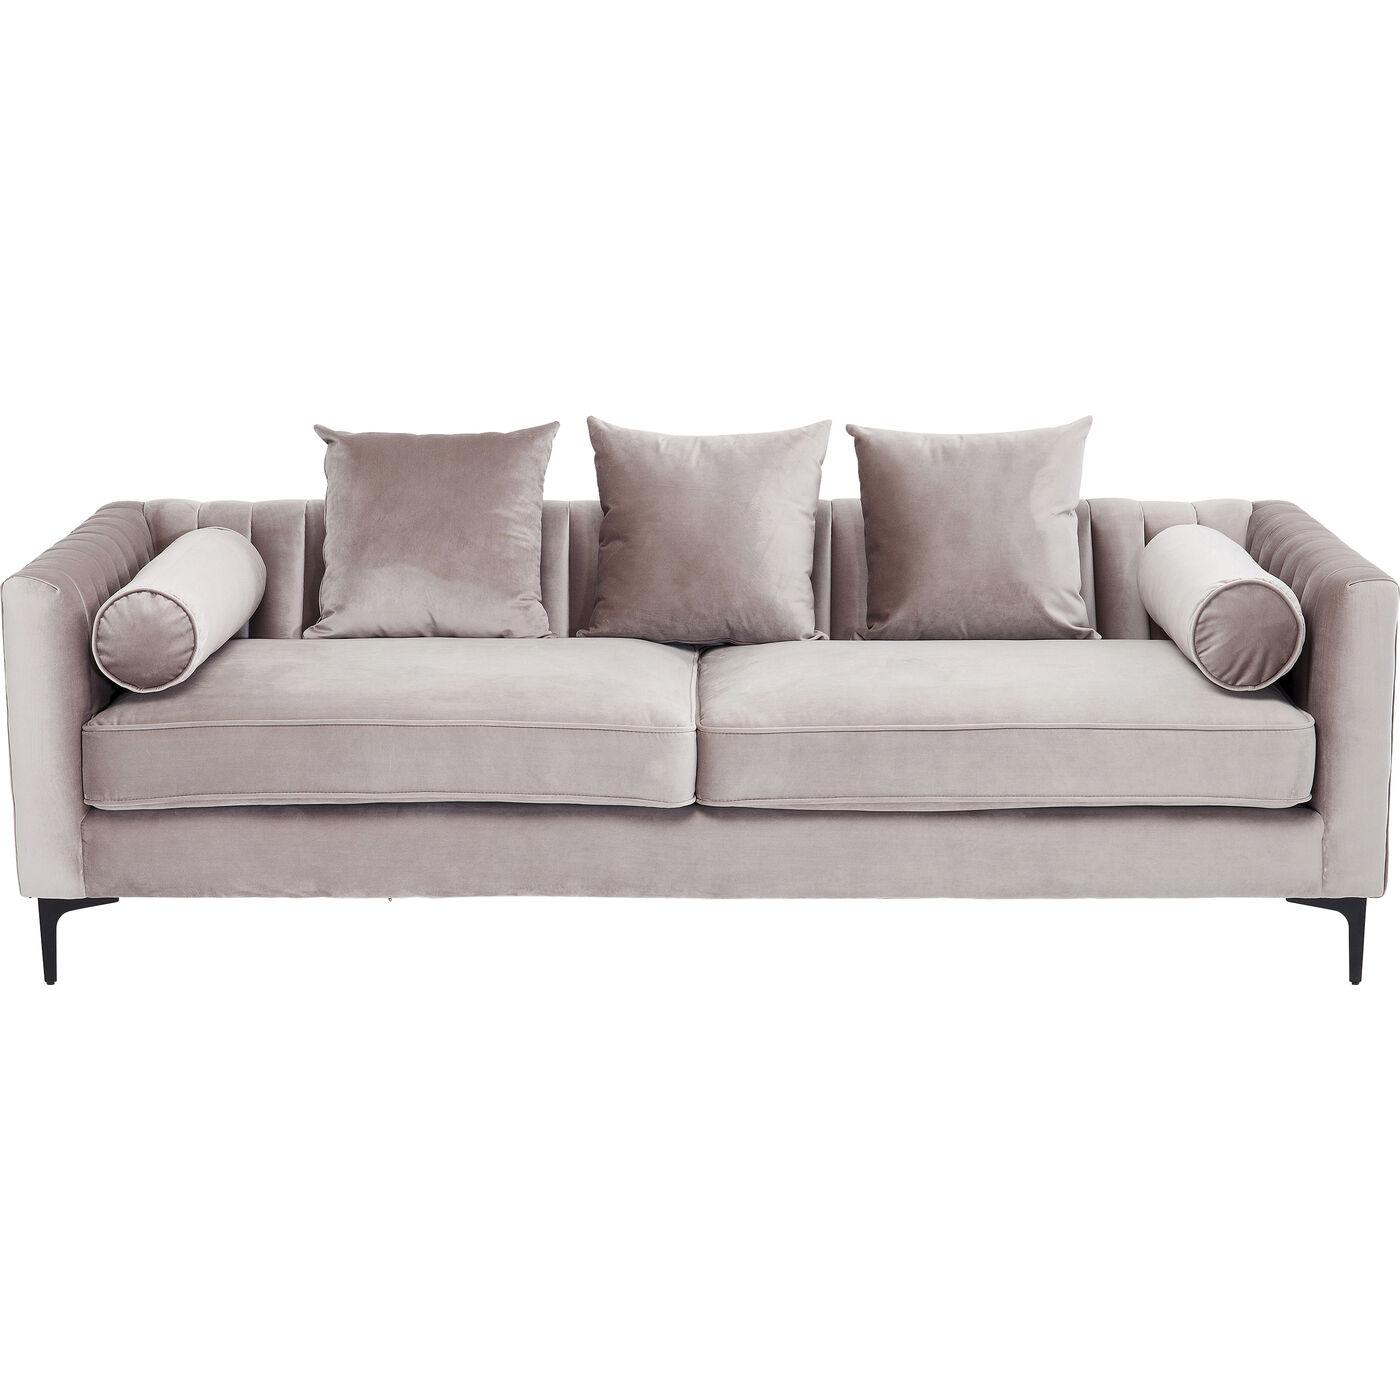 Sofa 3-Sitzer Variete Grau